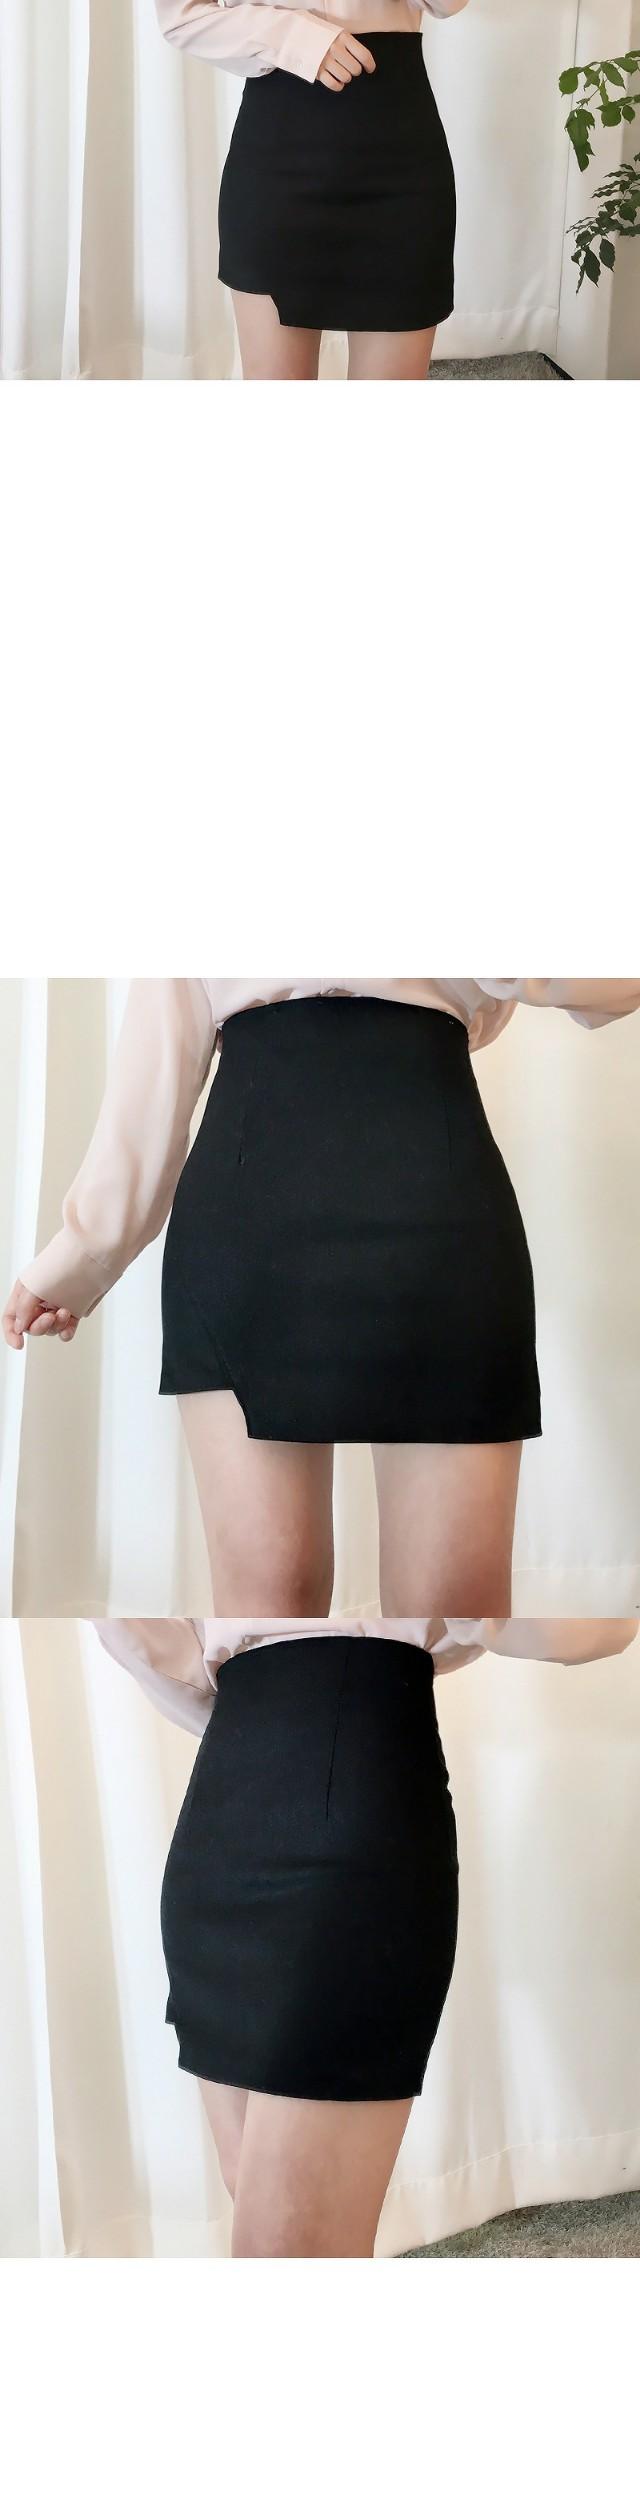 A half-skirt skirt